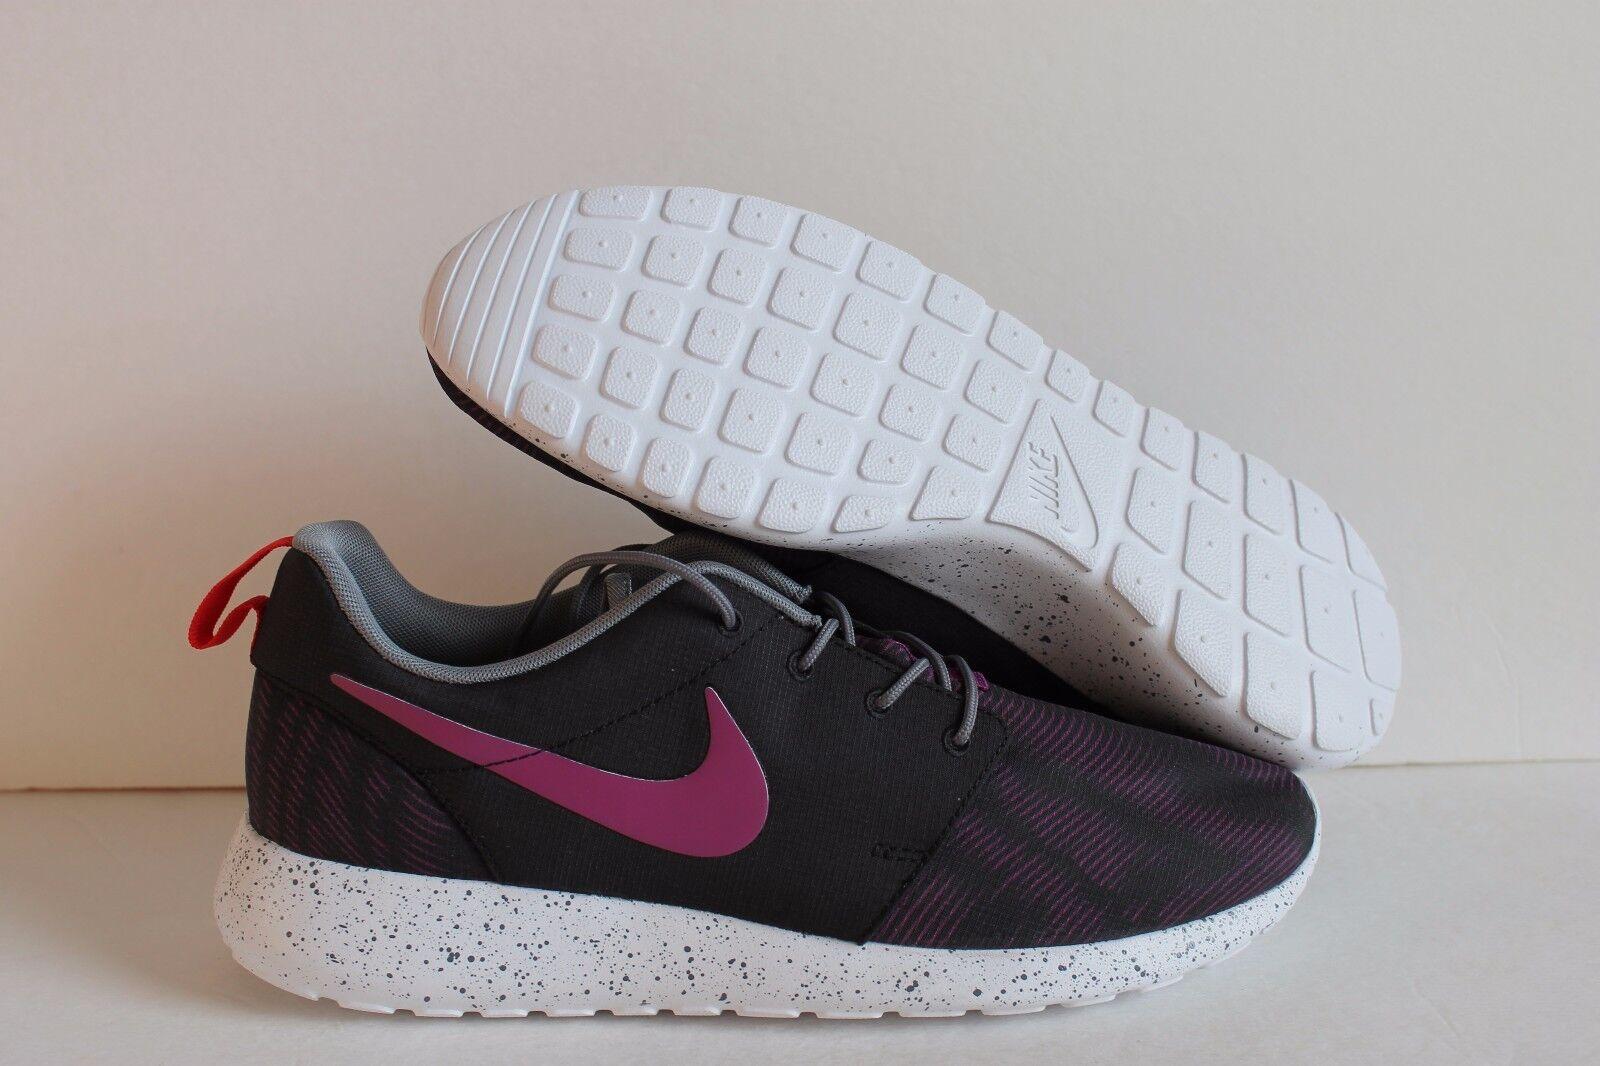 Nike uomini roshe correre id rosherun nero / viola / / bianco metallico sz 11 [704691-995]